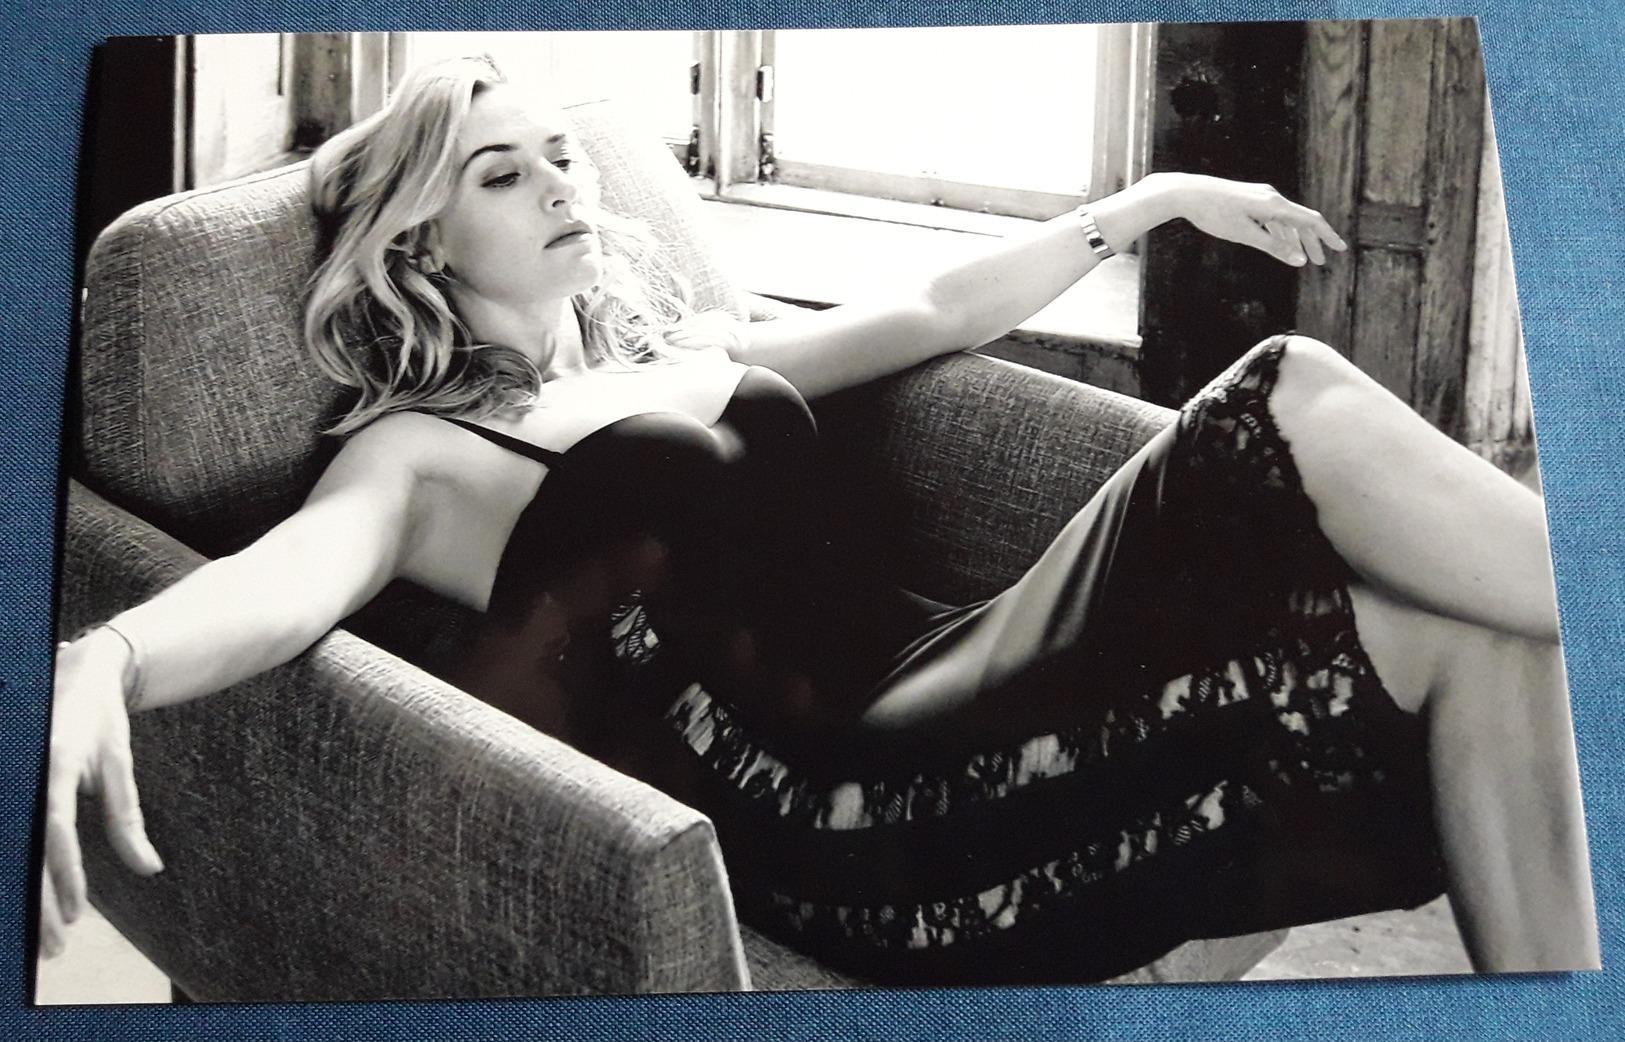 KATE WINSLET > Schauspielerin > Sexy Pin-Up Girl / Model > Hochglanz-Star-Photo Im Format Ca. 19 X 12,5 Cm (pf299) - Fotos